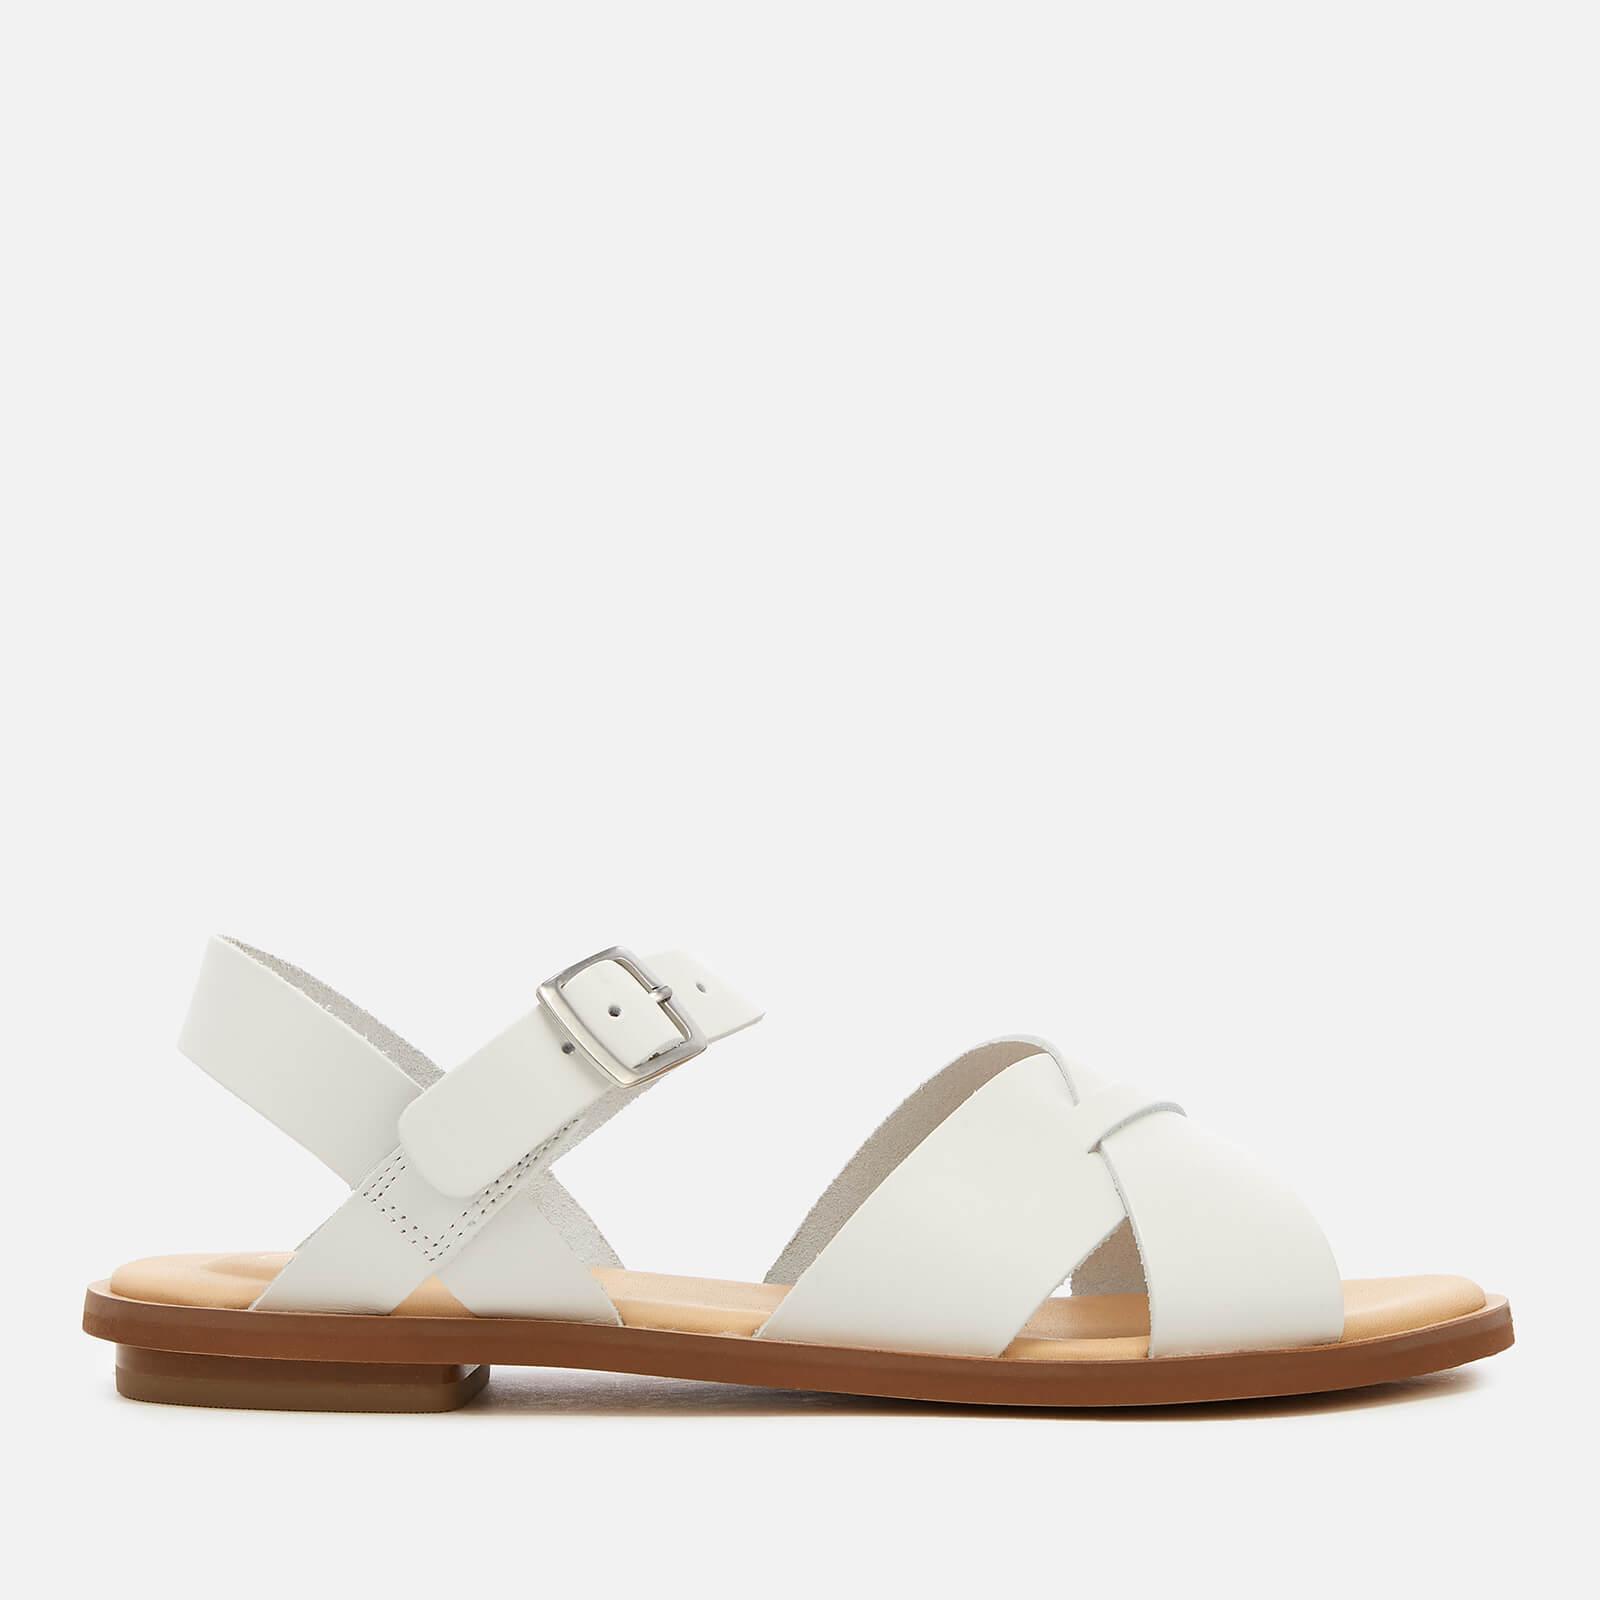 Clarks Women's Willow Gild Leather Sandals - White - UK 3 - White